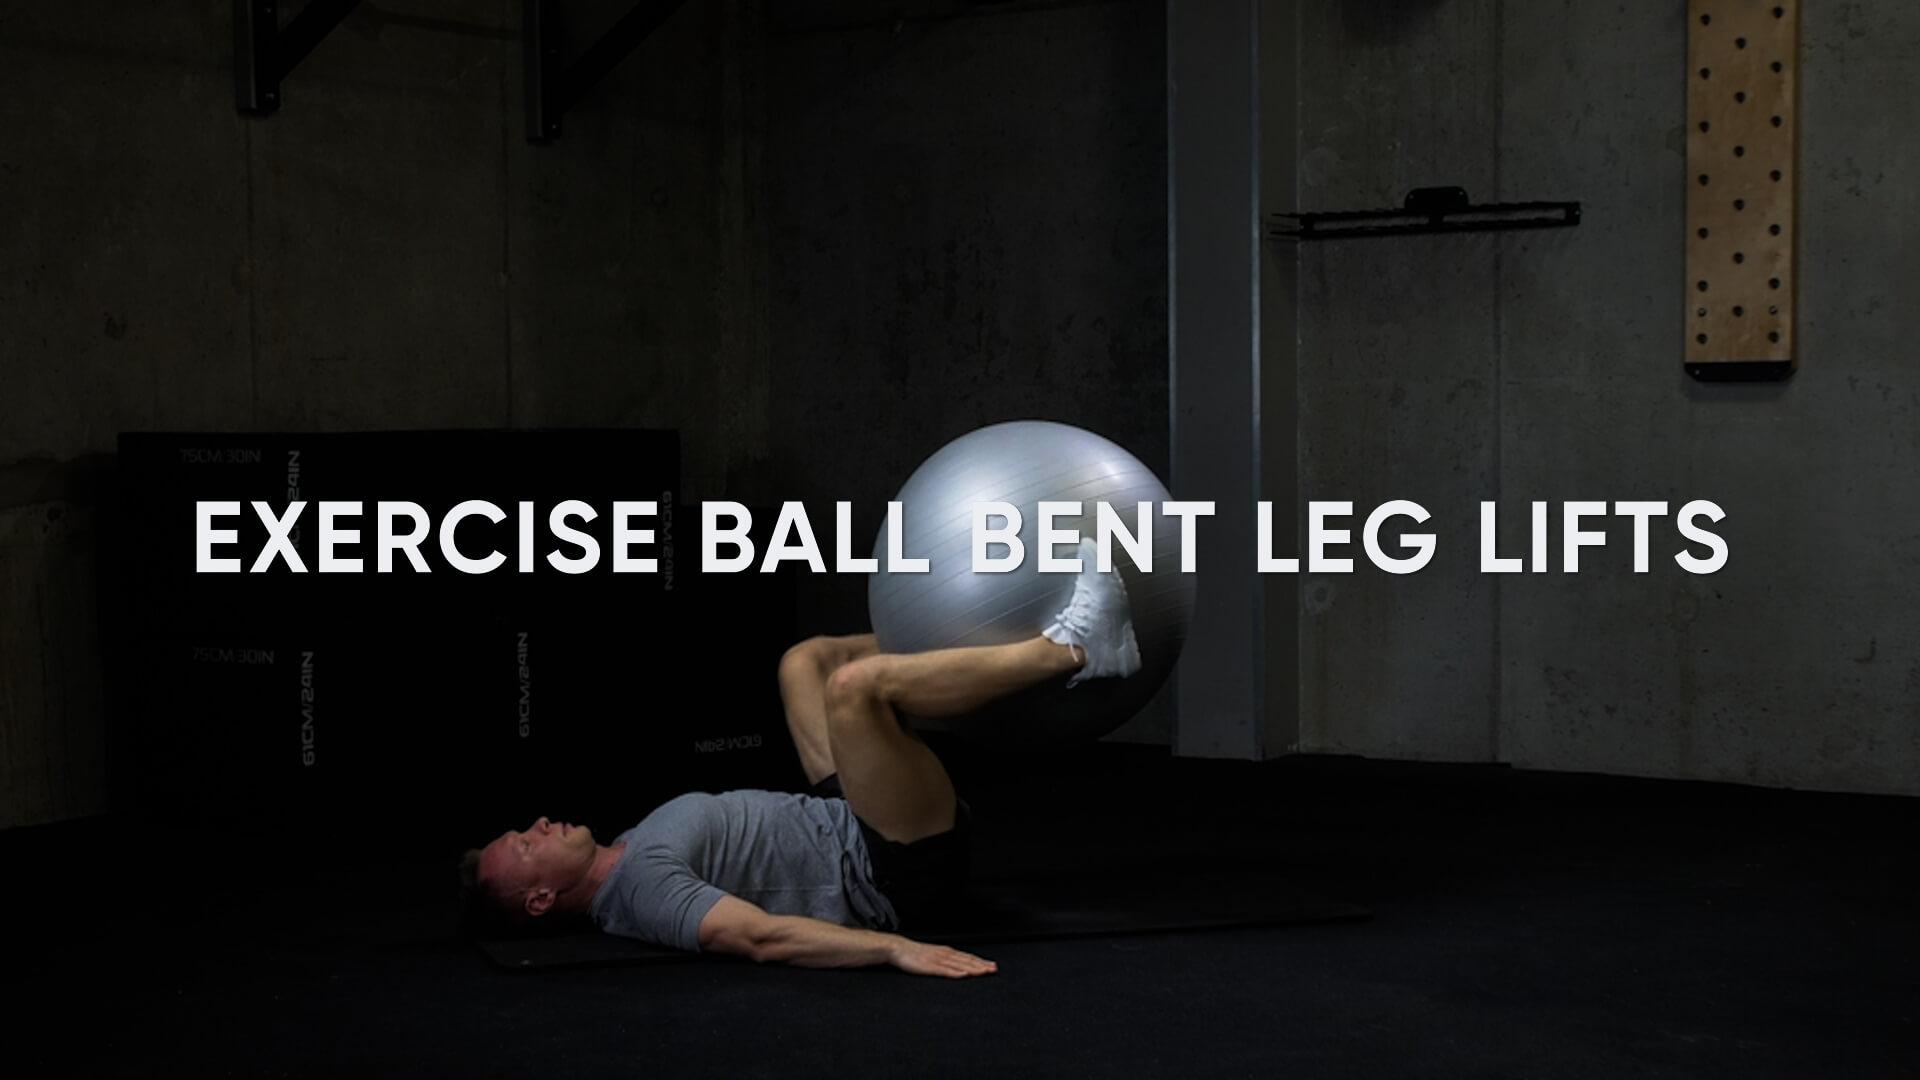 Exercise Ball Bent Leg Lifts